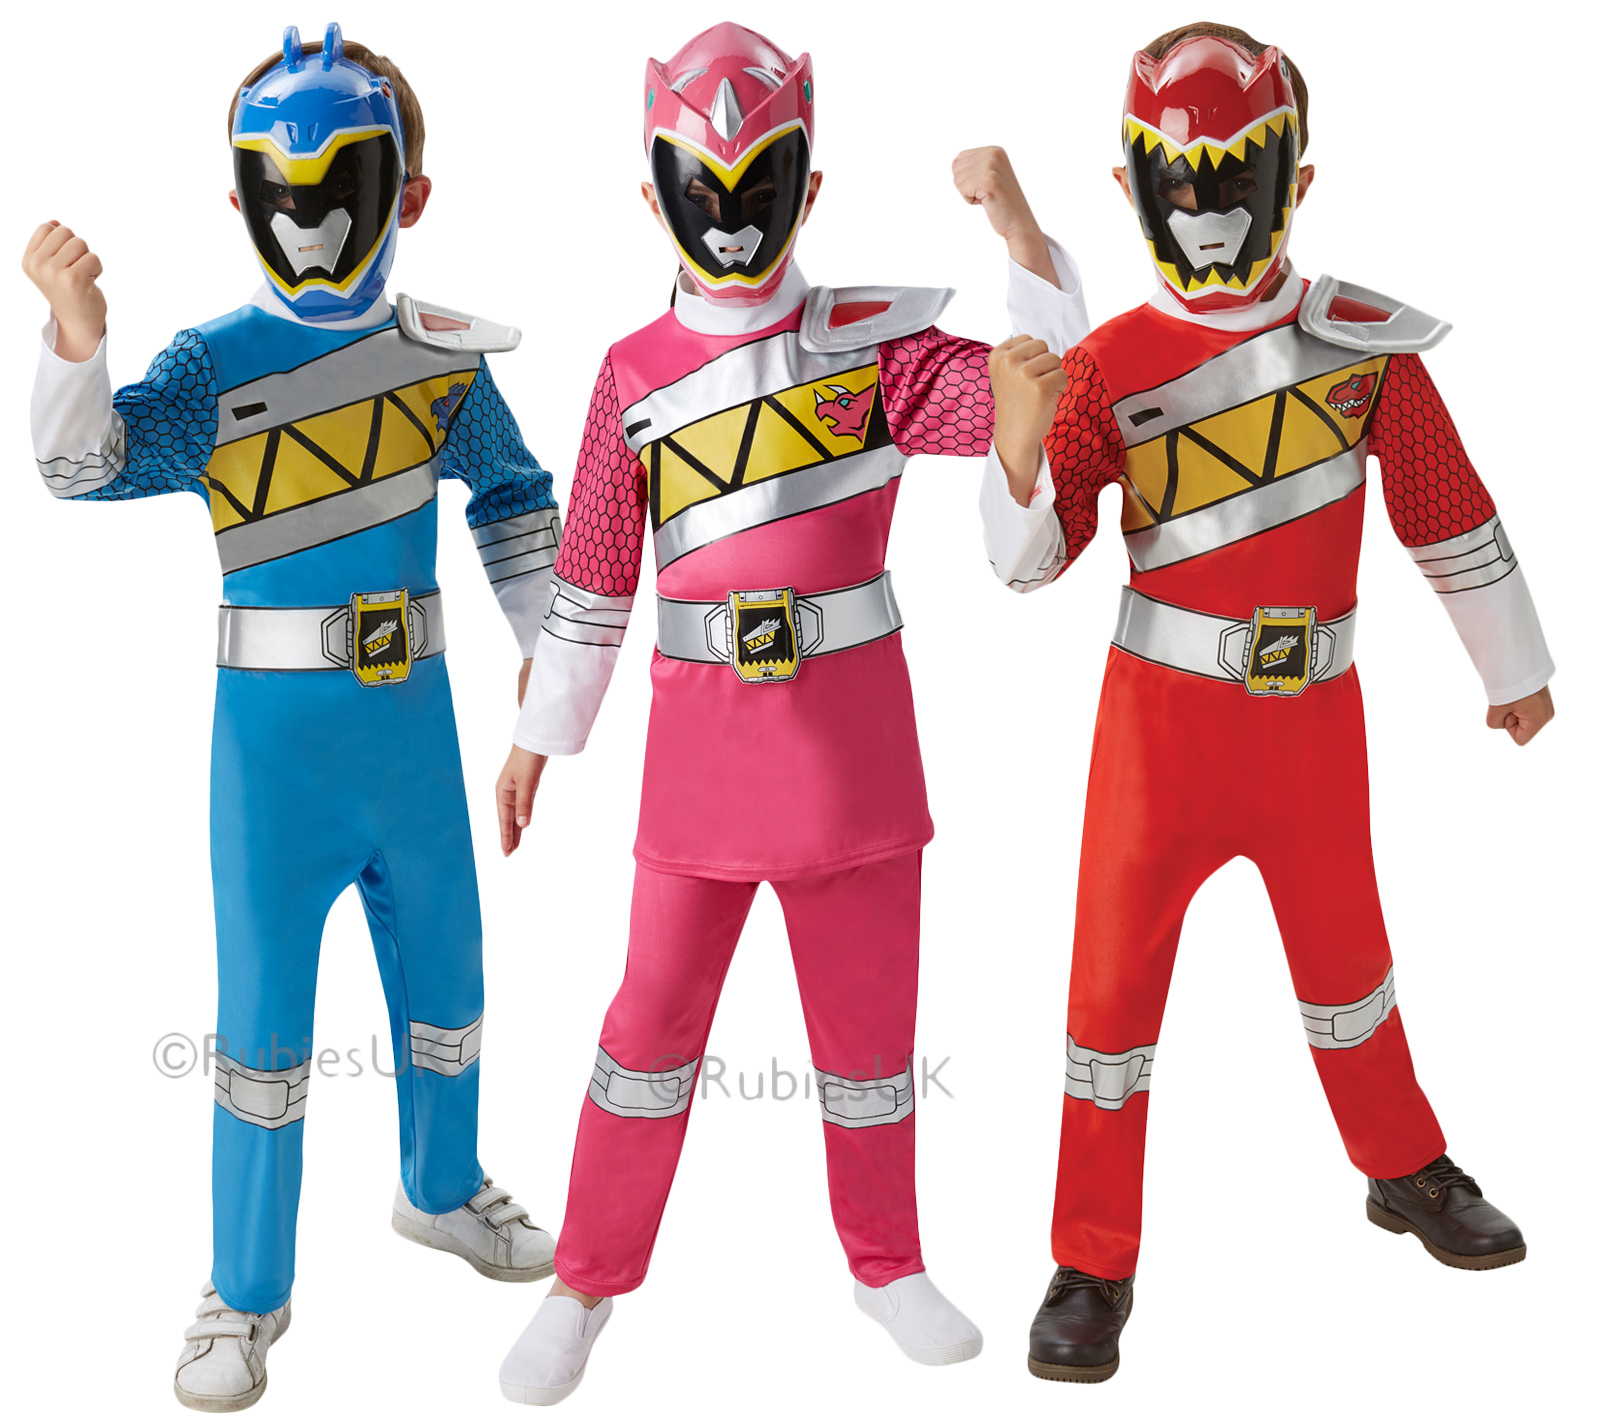 New Dino Charge Power Ranger Fancy Dress Superhero Rangers Kids ...